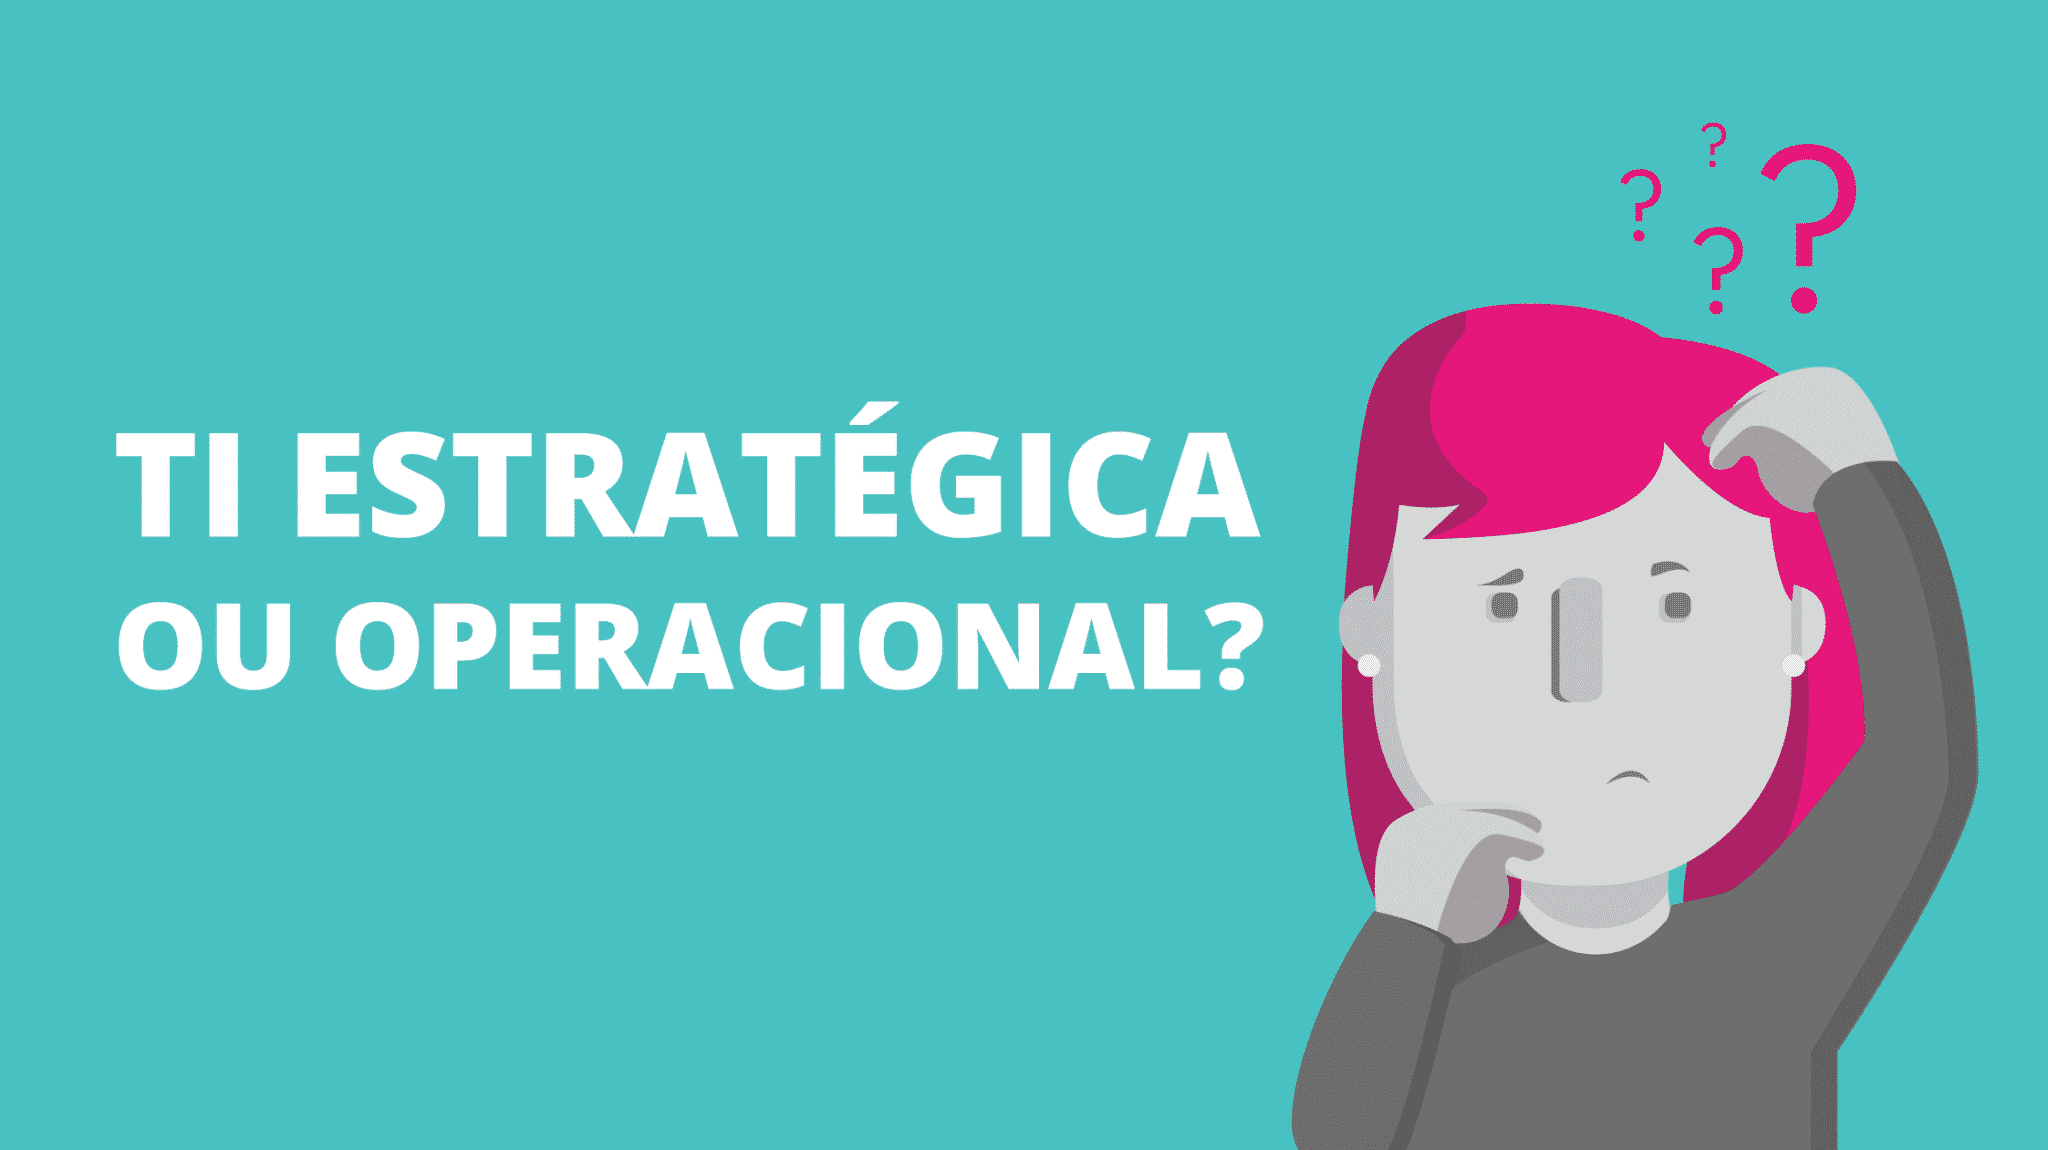 TI_estrategica_ou_operacional